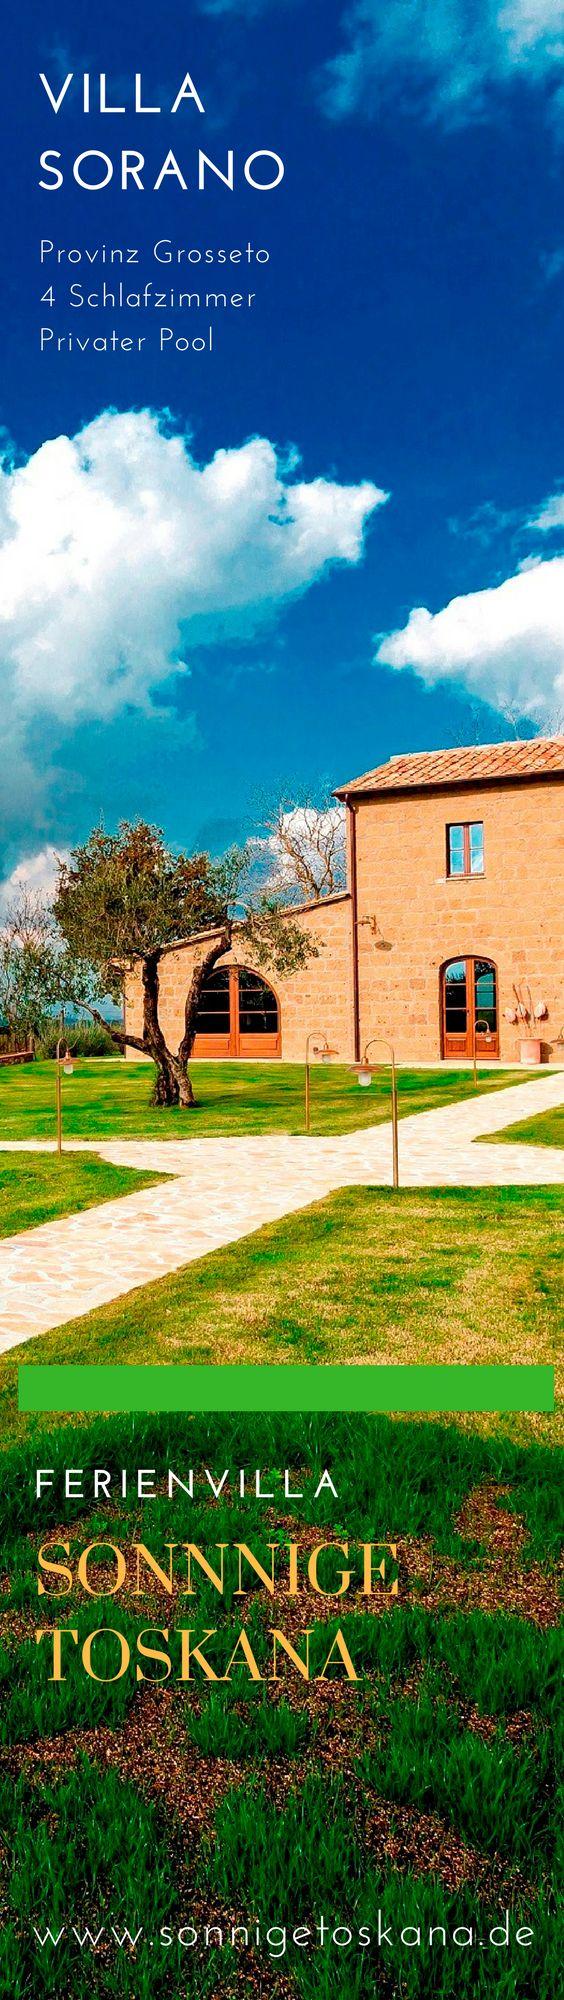 Villa Sorano, Italien, Toskana, Provinz Grosseto, 4 Schlafzimmer, Privater Pool. www.sonnigetoskana.de #ferienhaus #ferienvilla #sonnigetoskana #urlaub #reise #villa #mieten #rental #villa #italianvillas #travel #travelitaly #tuscany #toskana